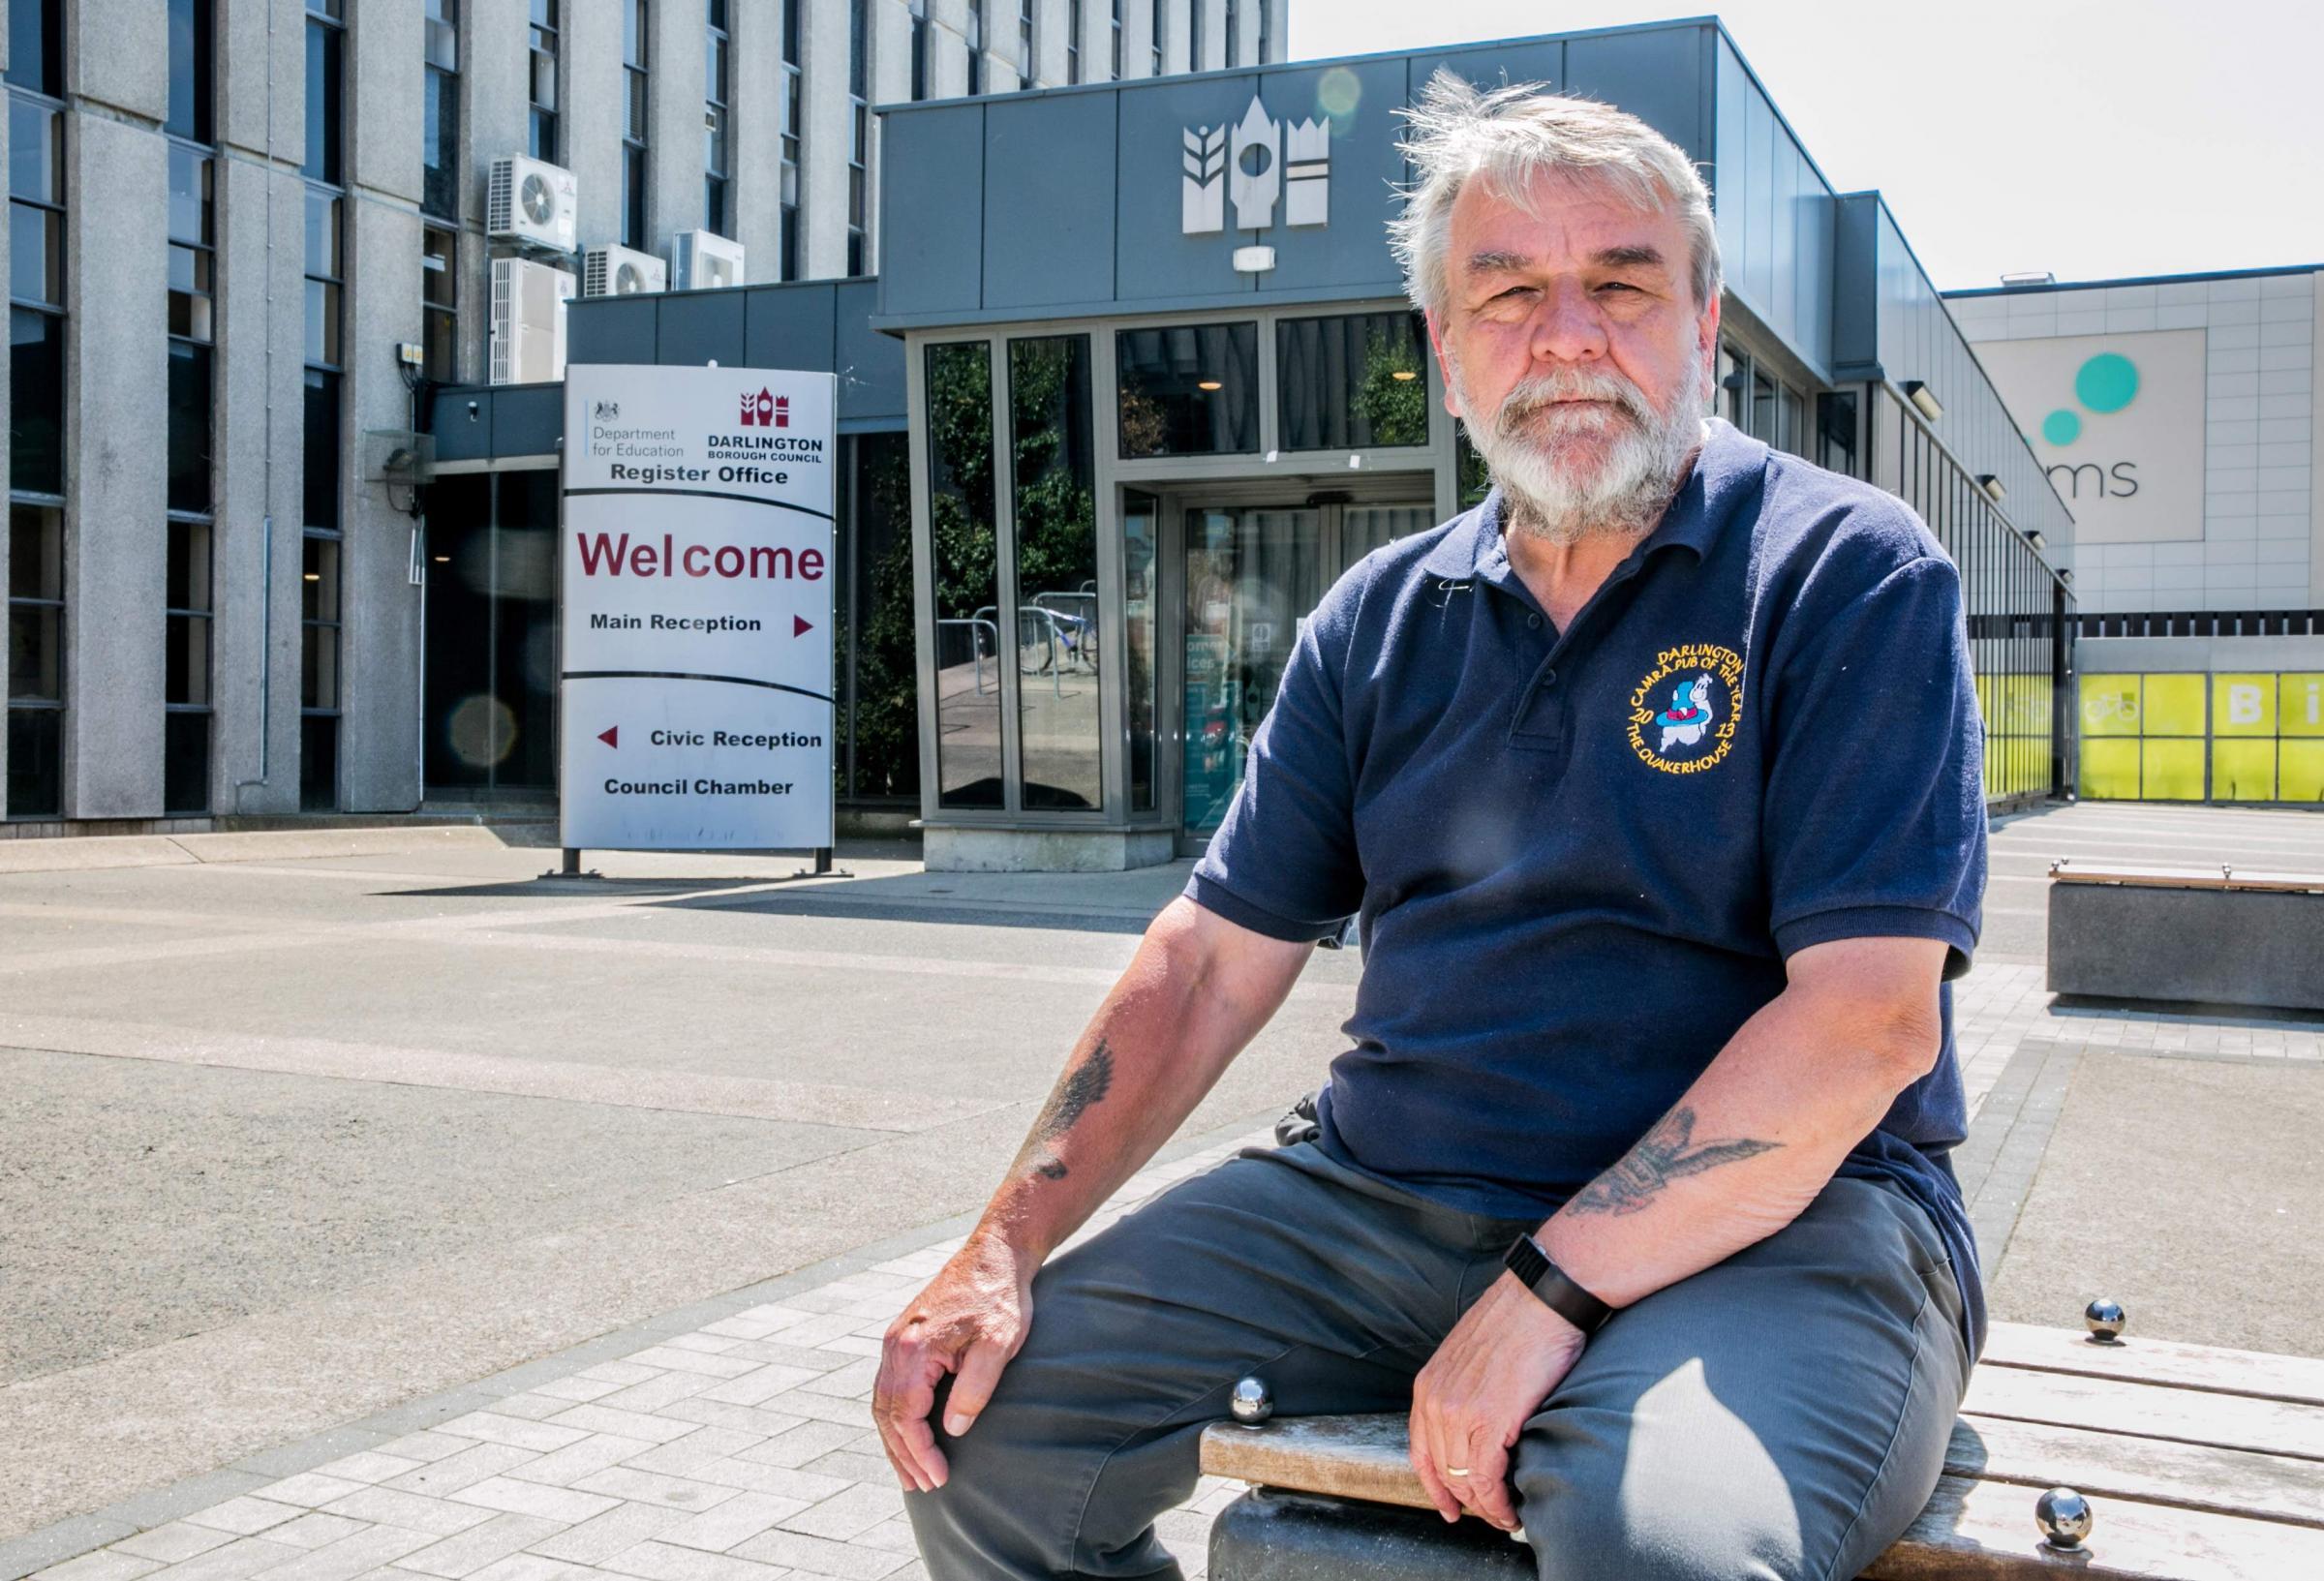 Bill Dixon to resign as Darlington Borough